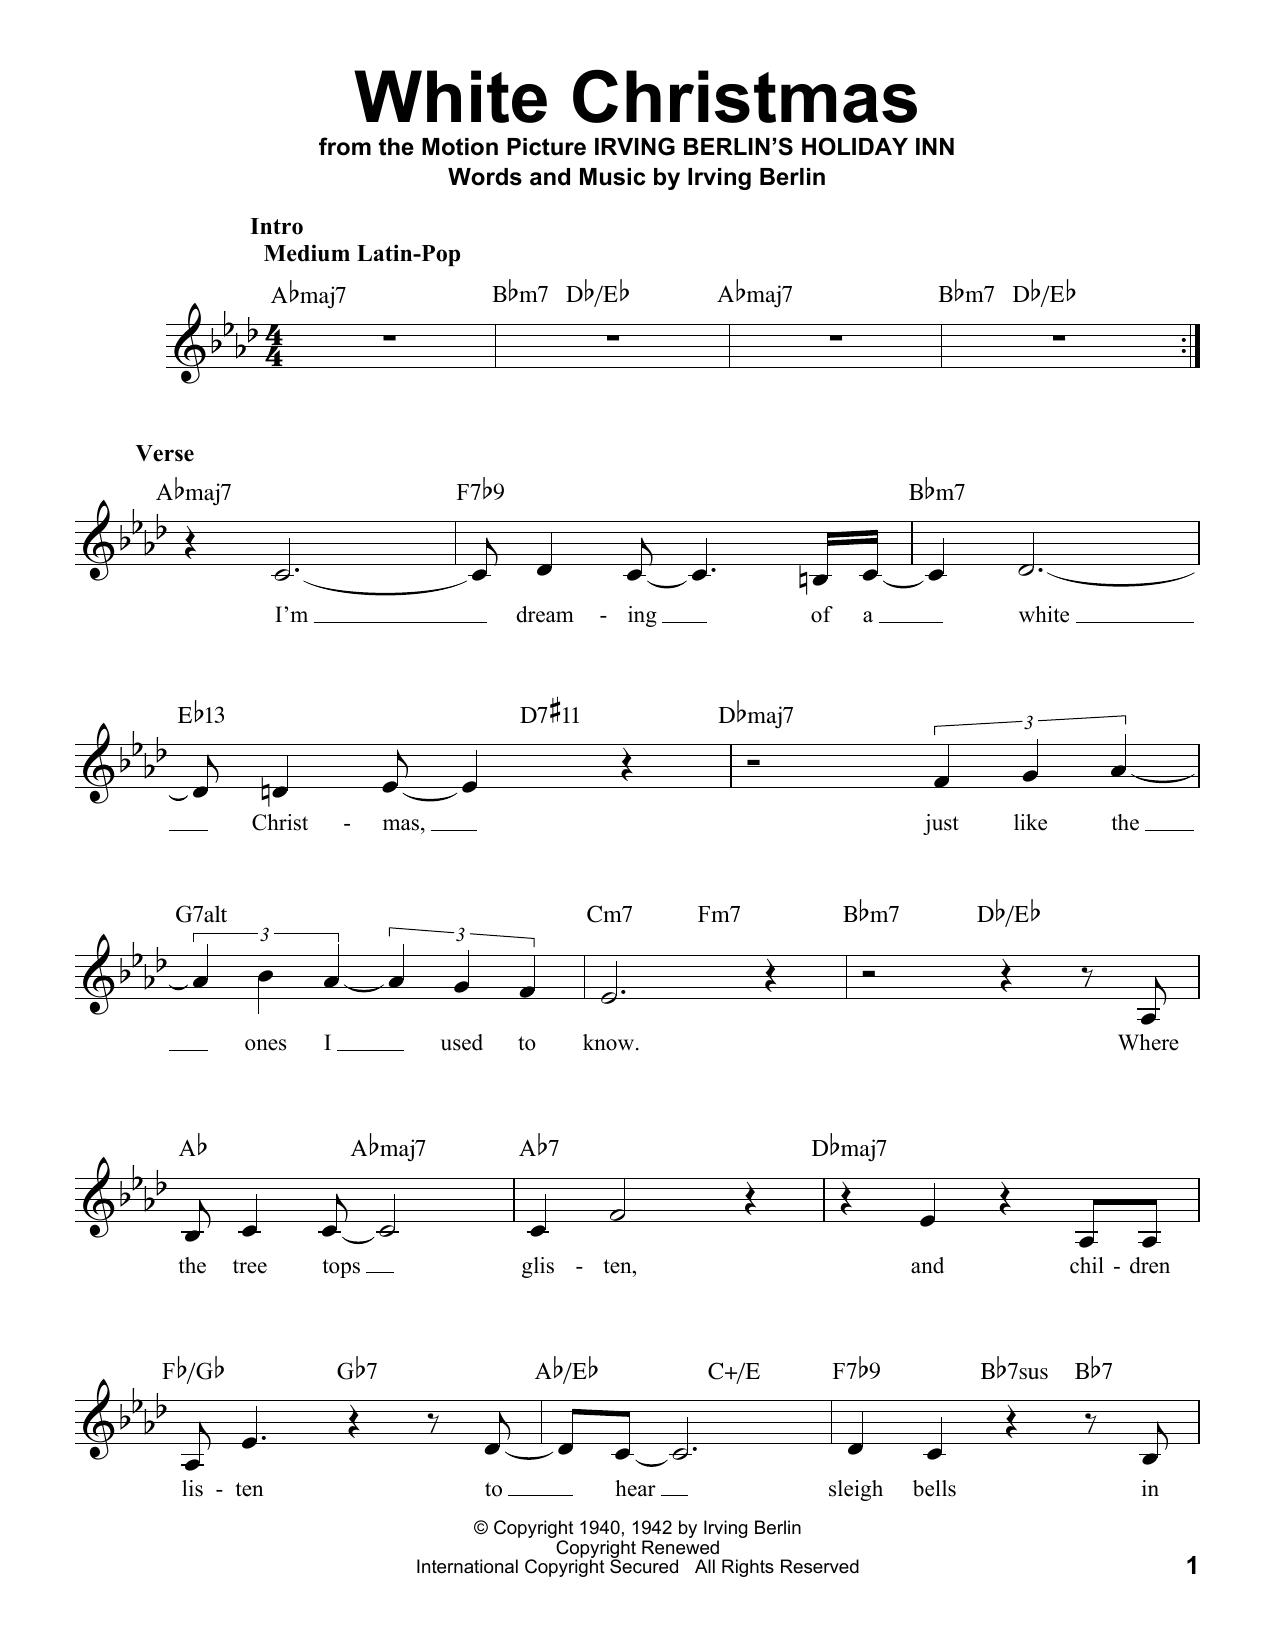 White Christmas Sheet Music | Irving Berlin | Pro Vocal